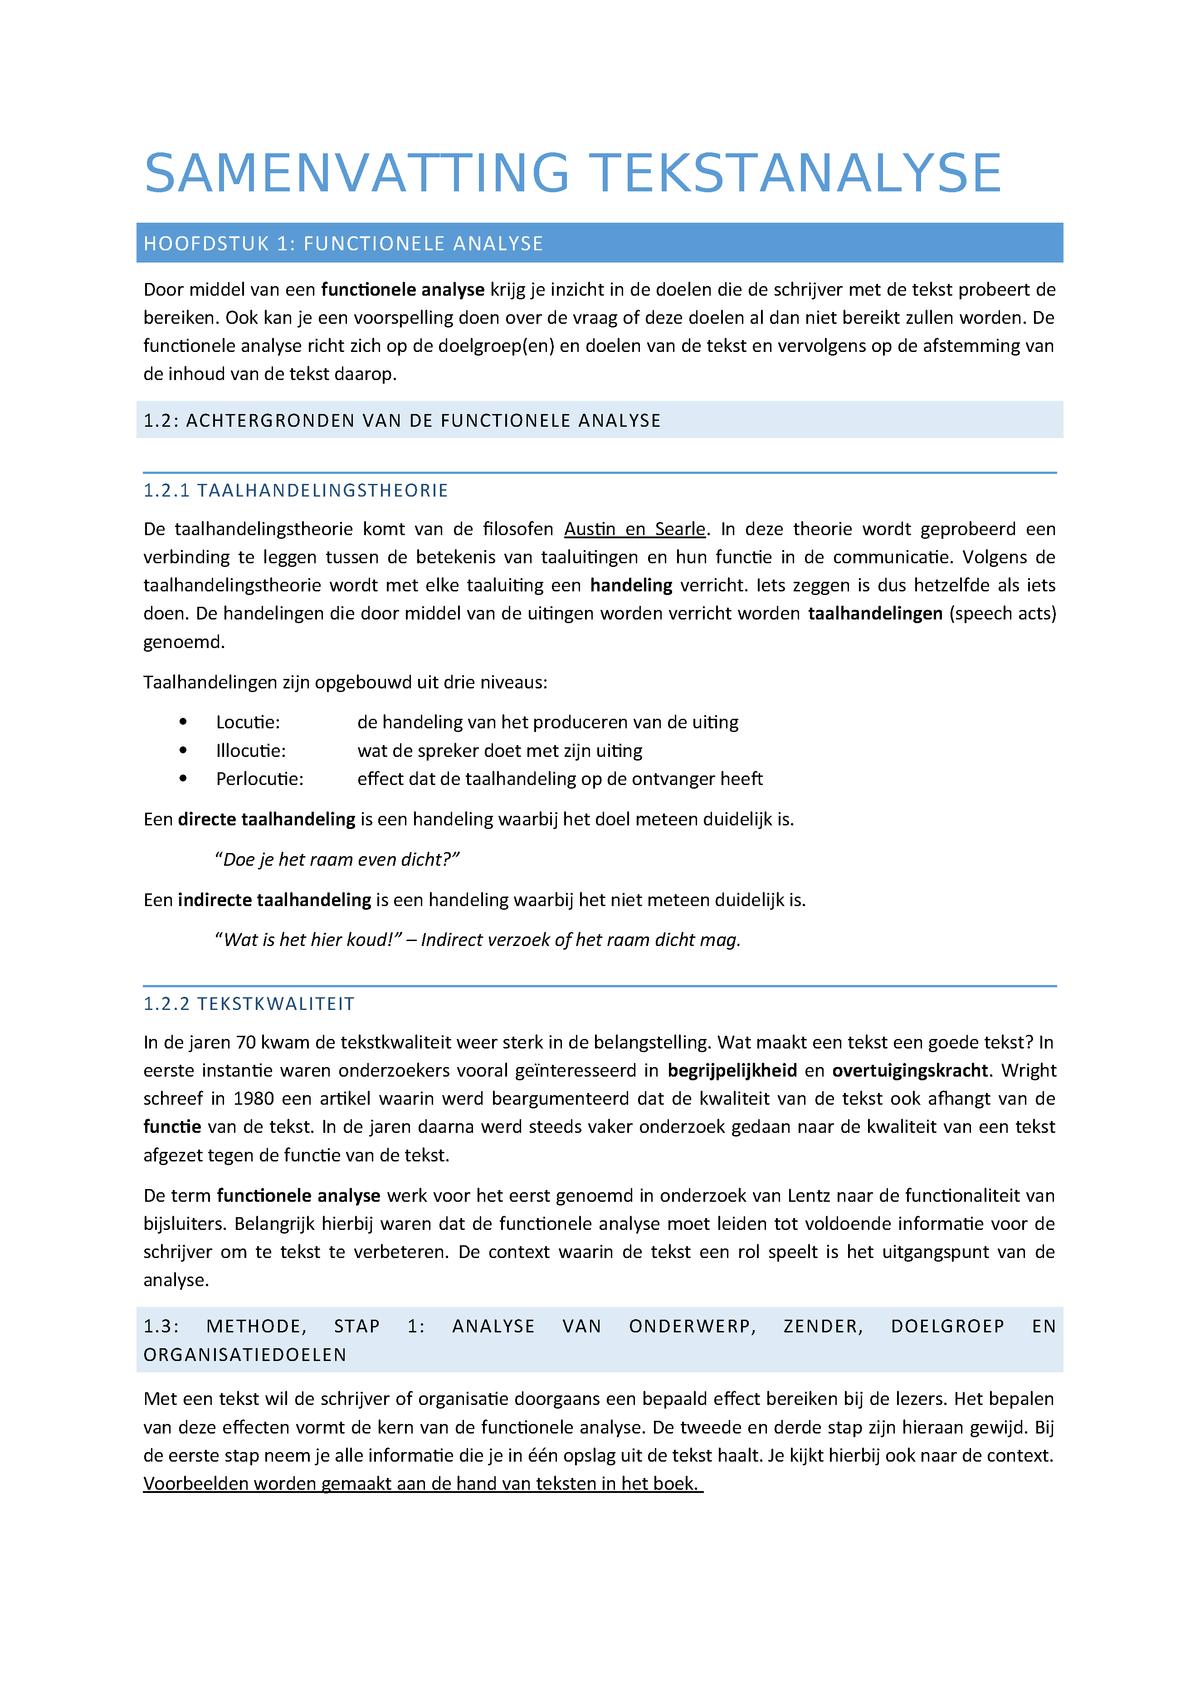 Samenvatting Tekstanalyse 22 Mar 2016 Studeersnelnl